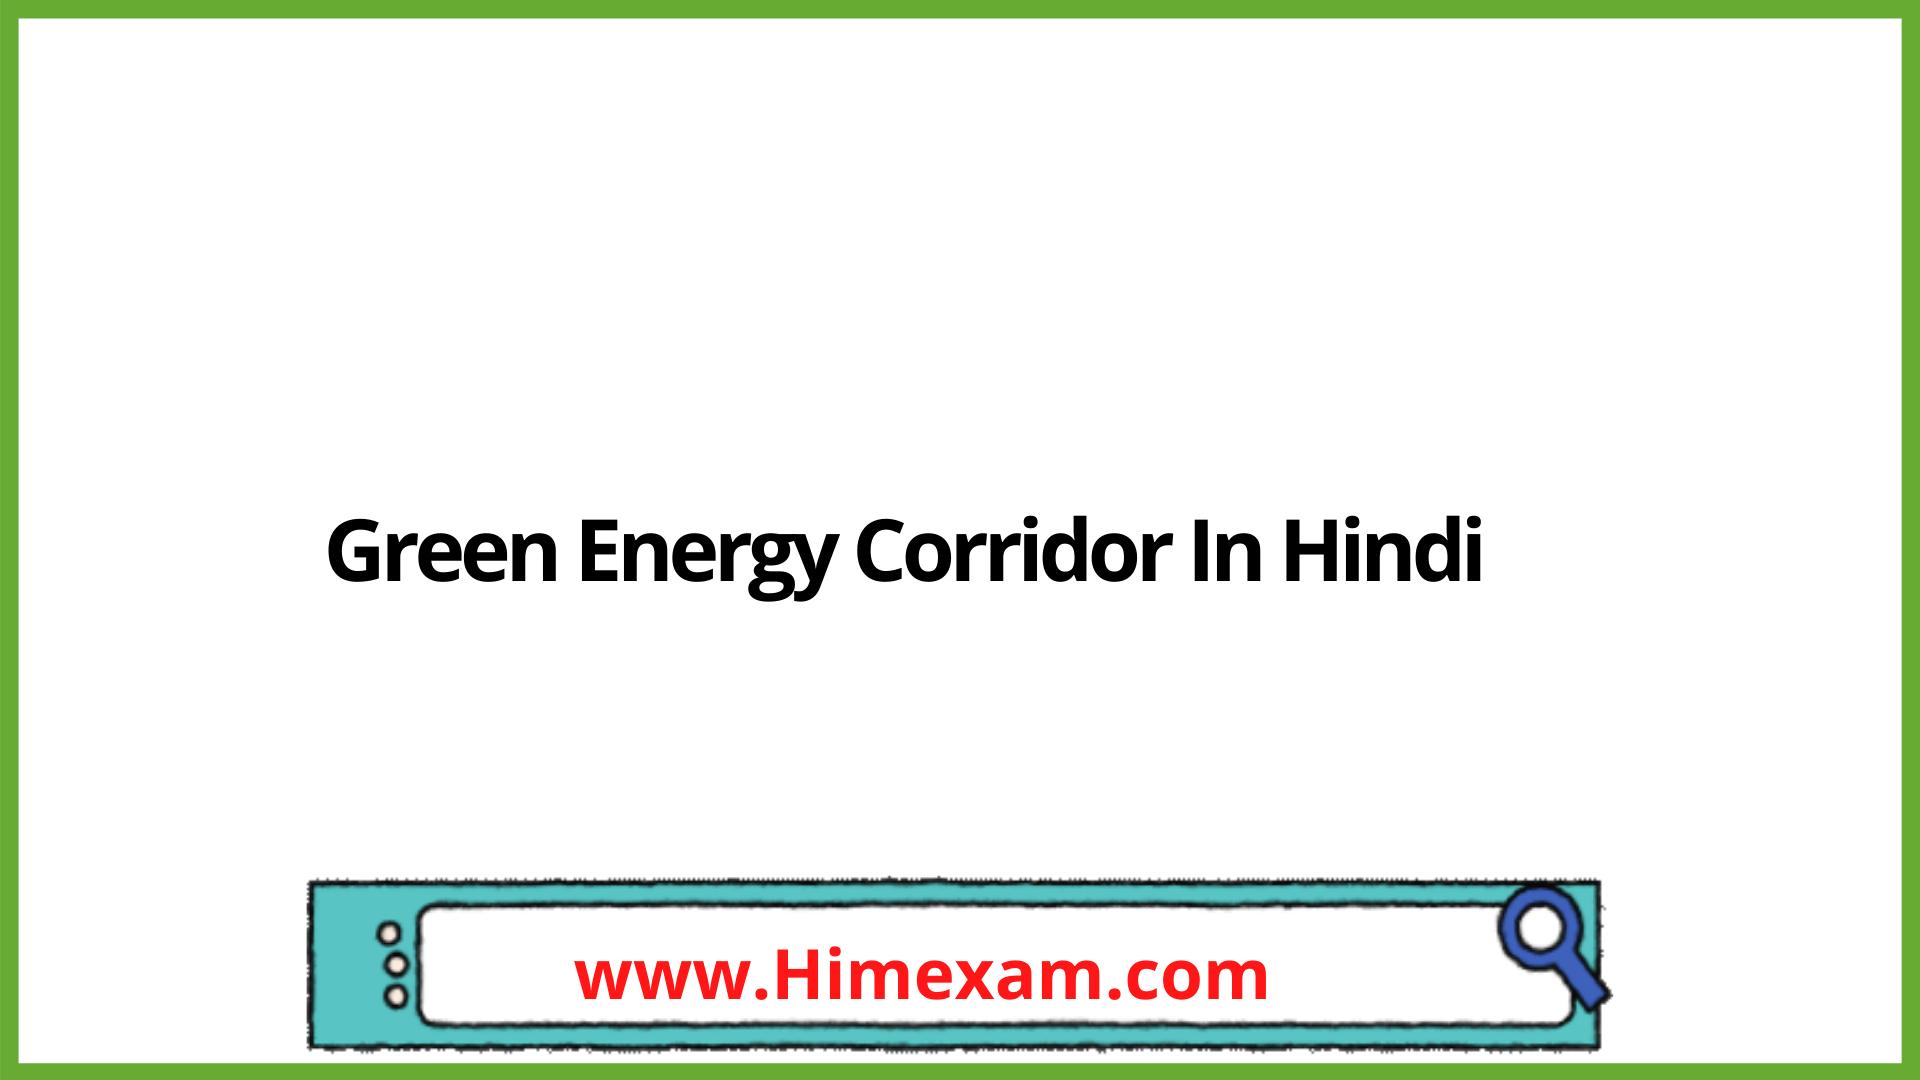 Green Energy Corridor In Hindi